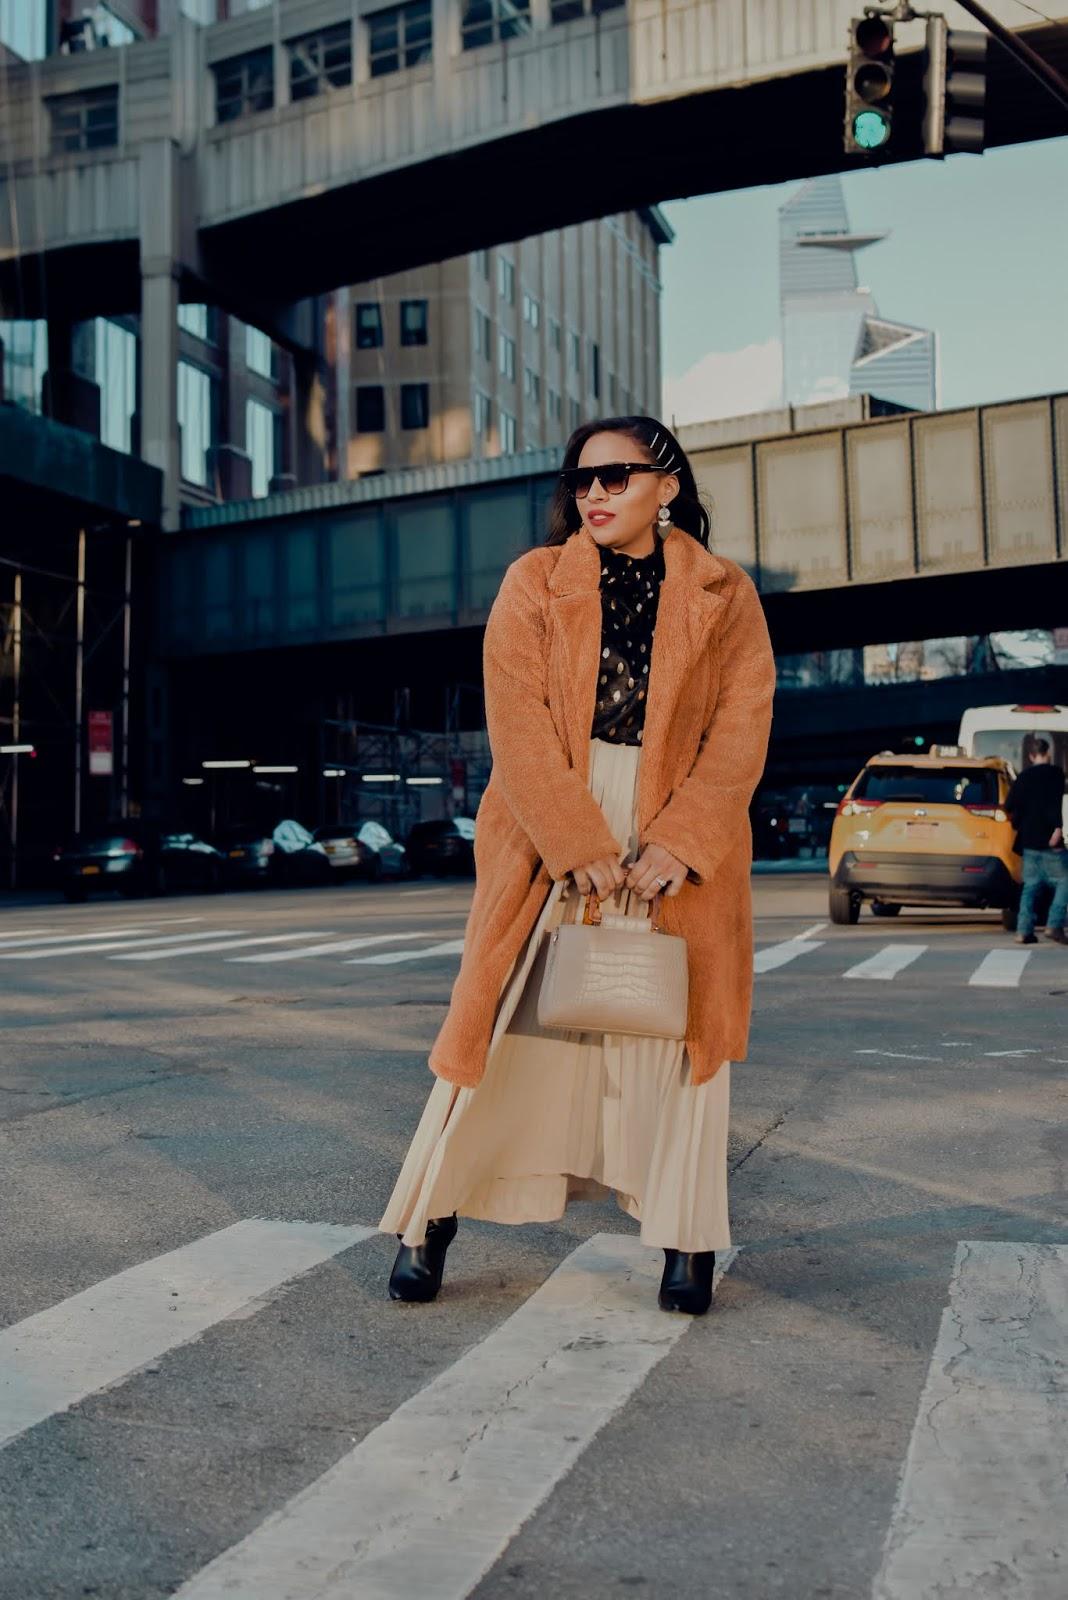 nyfw, nyfwstreetstyle, nyfw, fall winter 2020 trends, fashion week, nyfw20, custo barcelona, hakkan akaya, rebecca minkoff, shein, pleated skirt trend